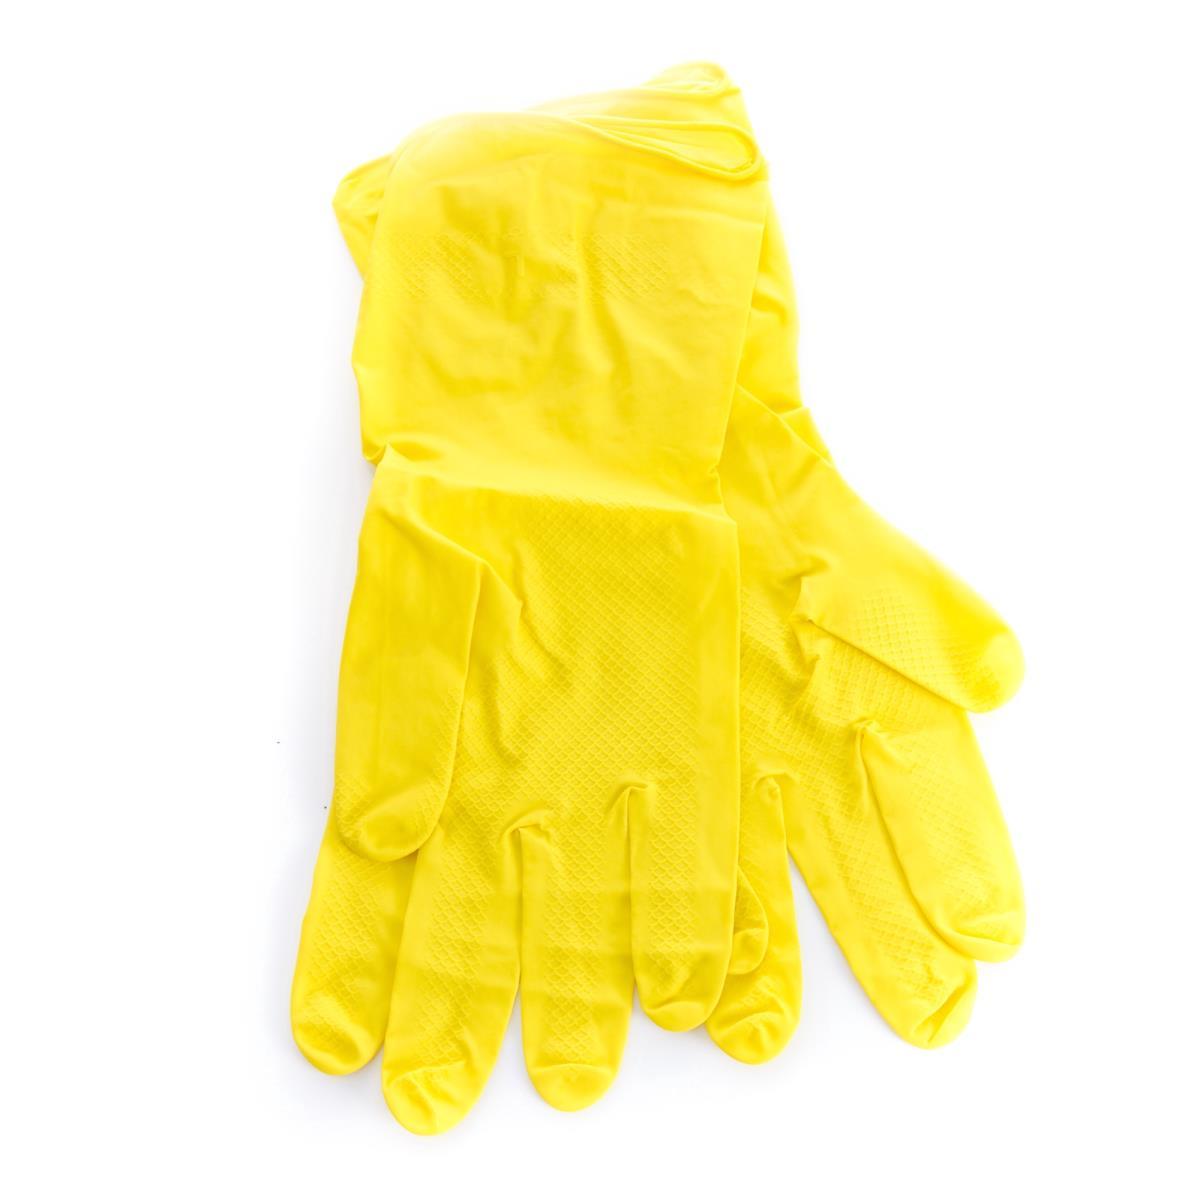 1 Paar Latex Handschuhe Gelb Haushaltshandschuhe Putzhandschuhe Handschuhe Gr.XL,Okko,GL41, 4772013082149